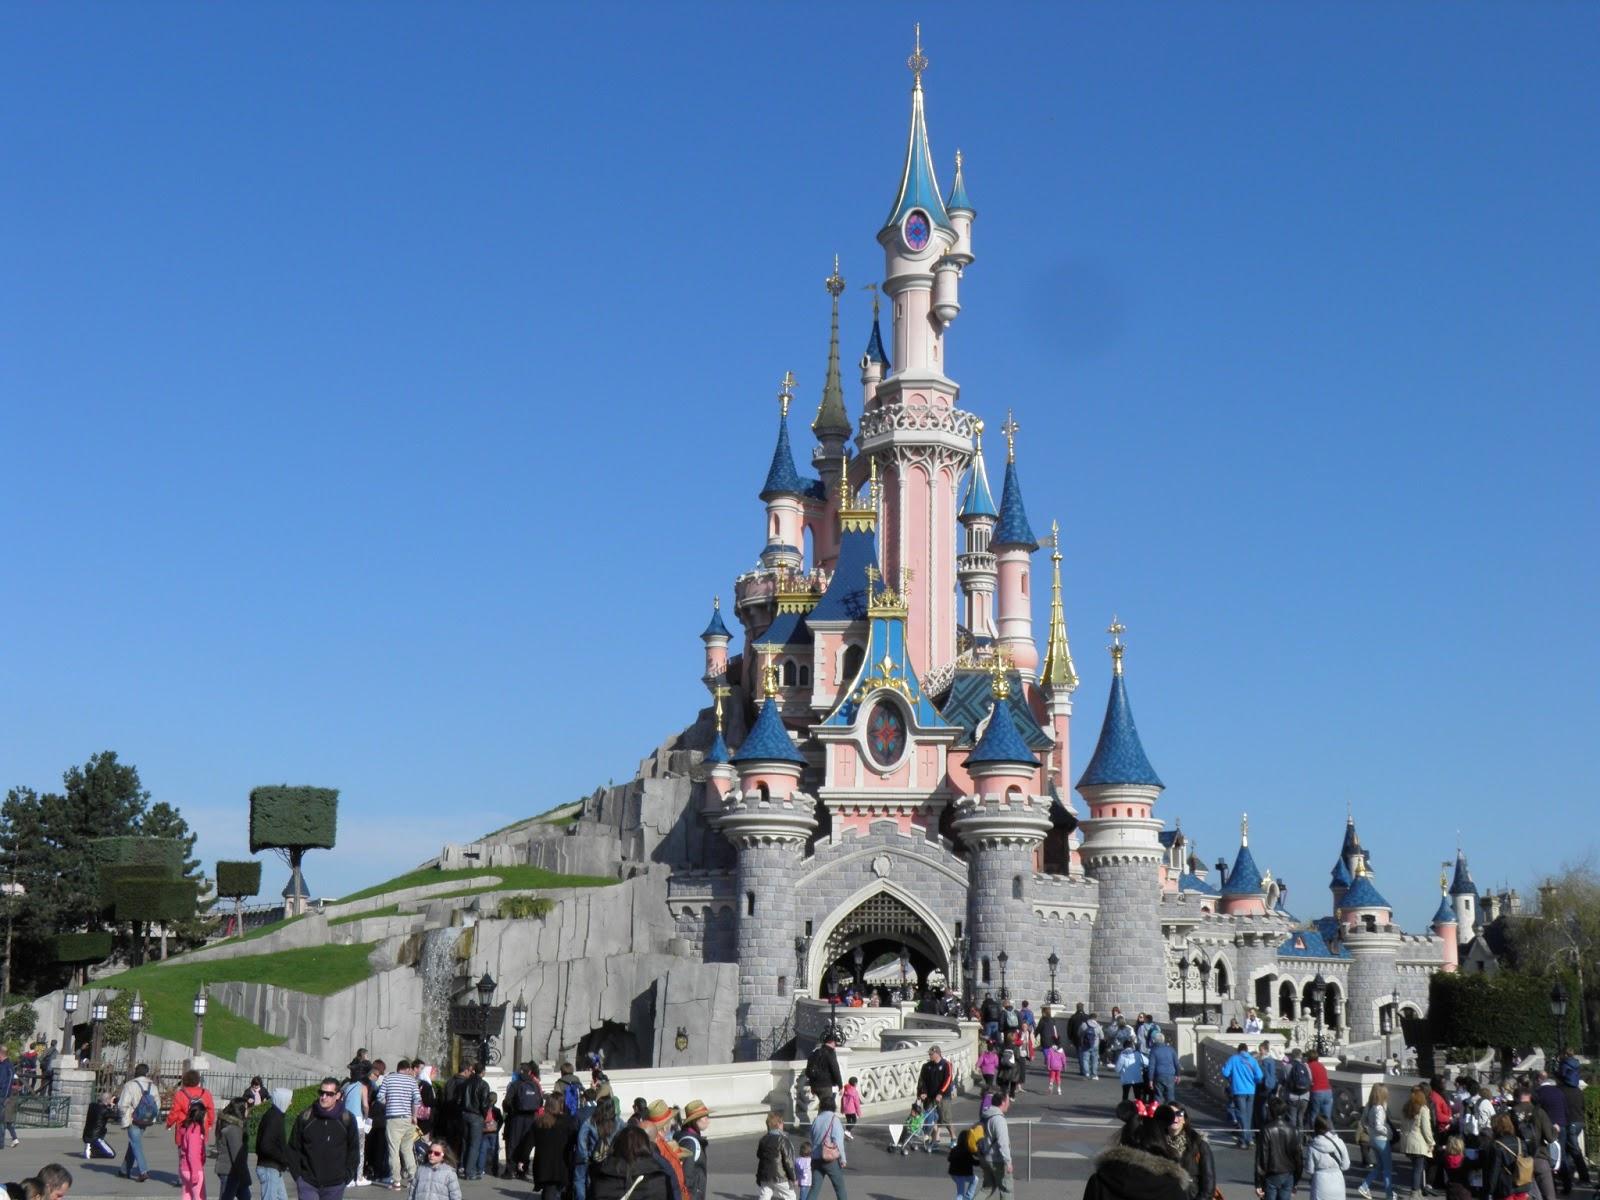 Disneyland Paris - Day One - ChelseaMamma  Disneyland Pari...